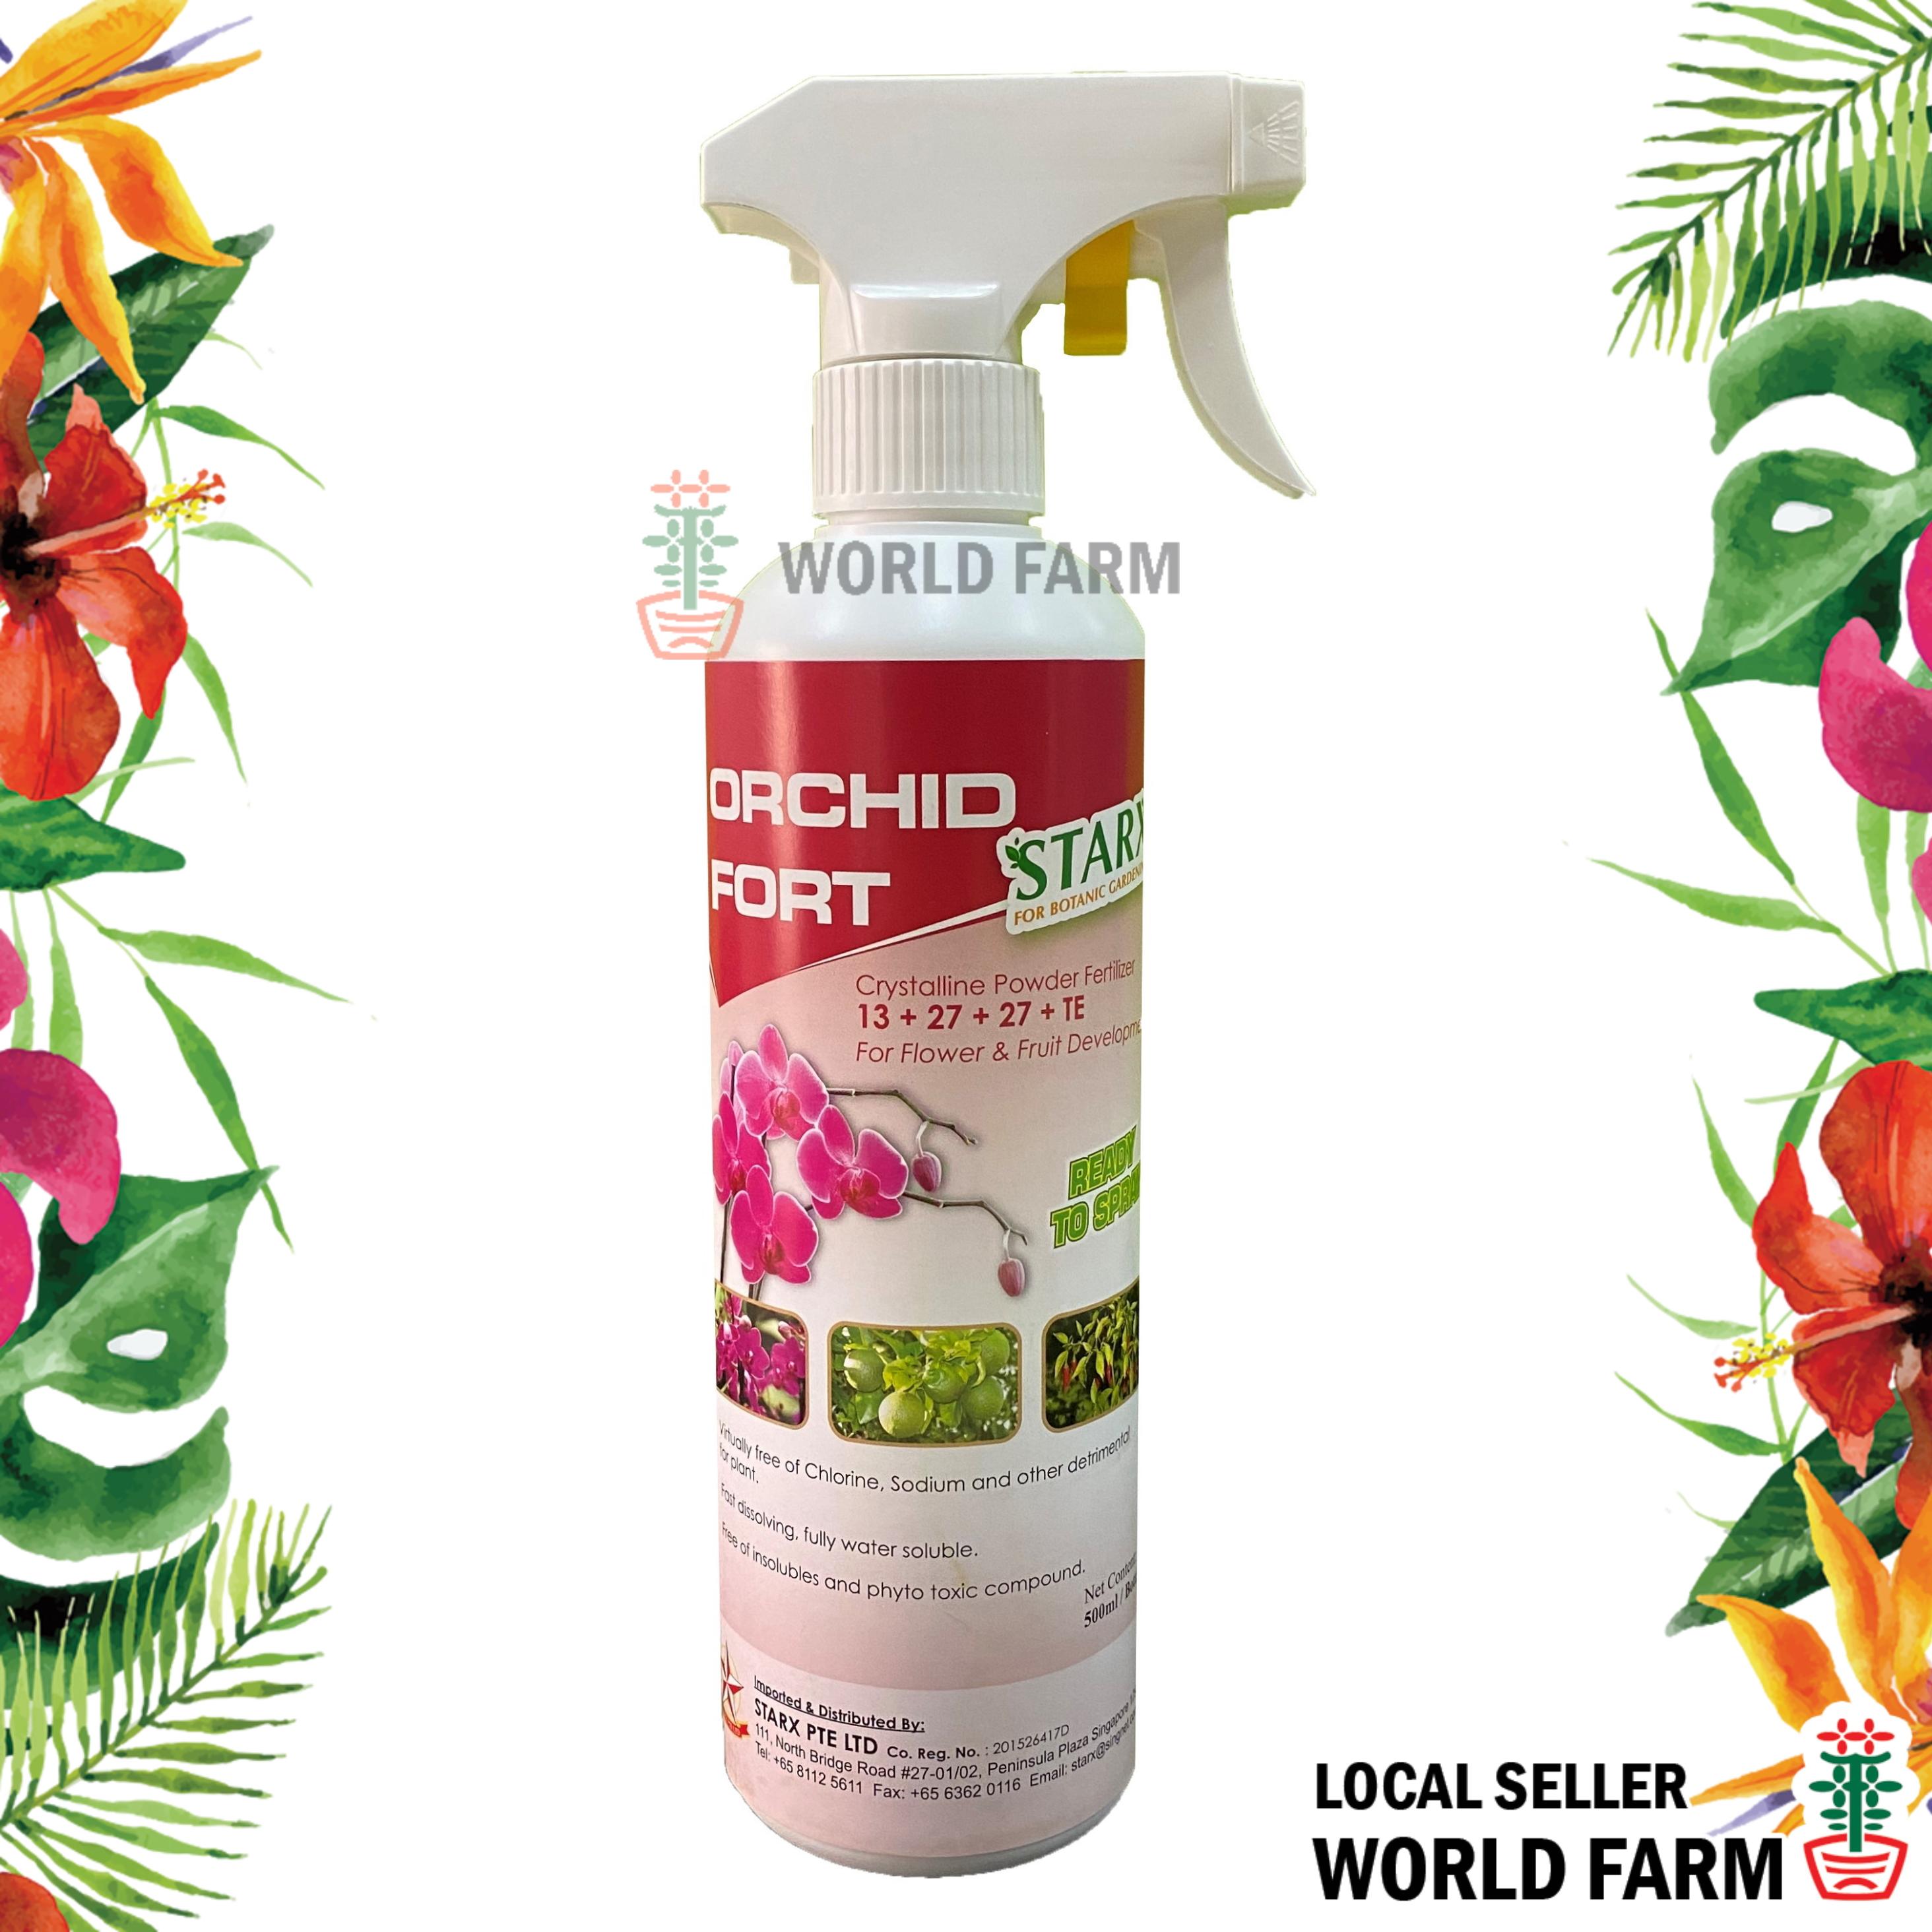 Orchid Fort Flowering Orchid Fertiliser / Fertilizer Spray 500ml